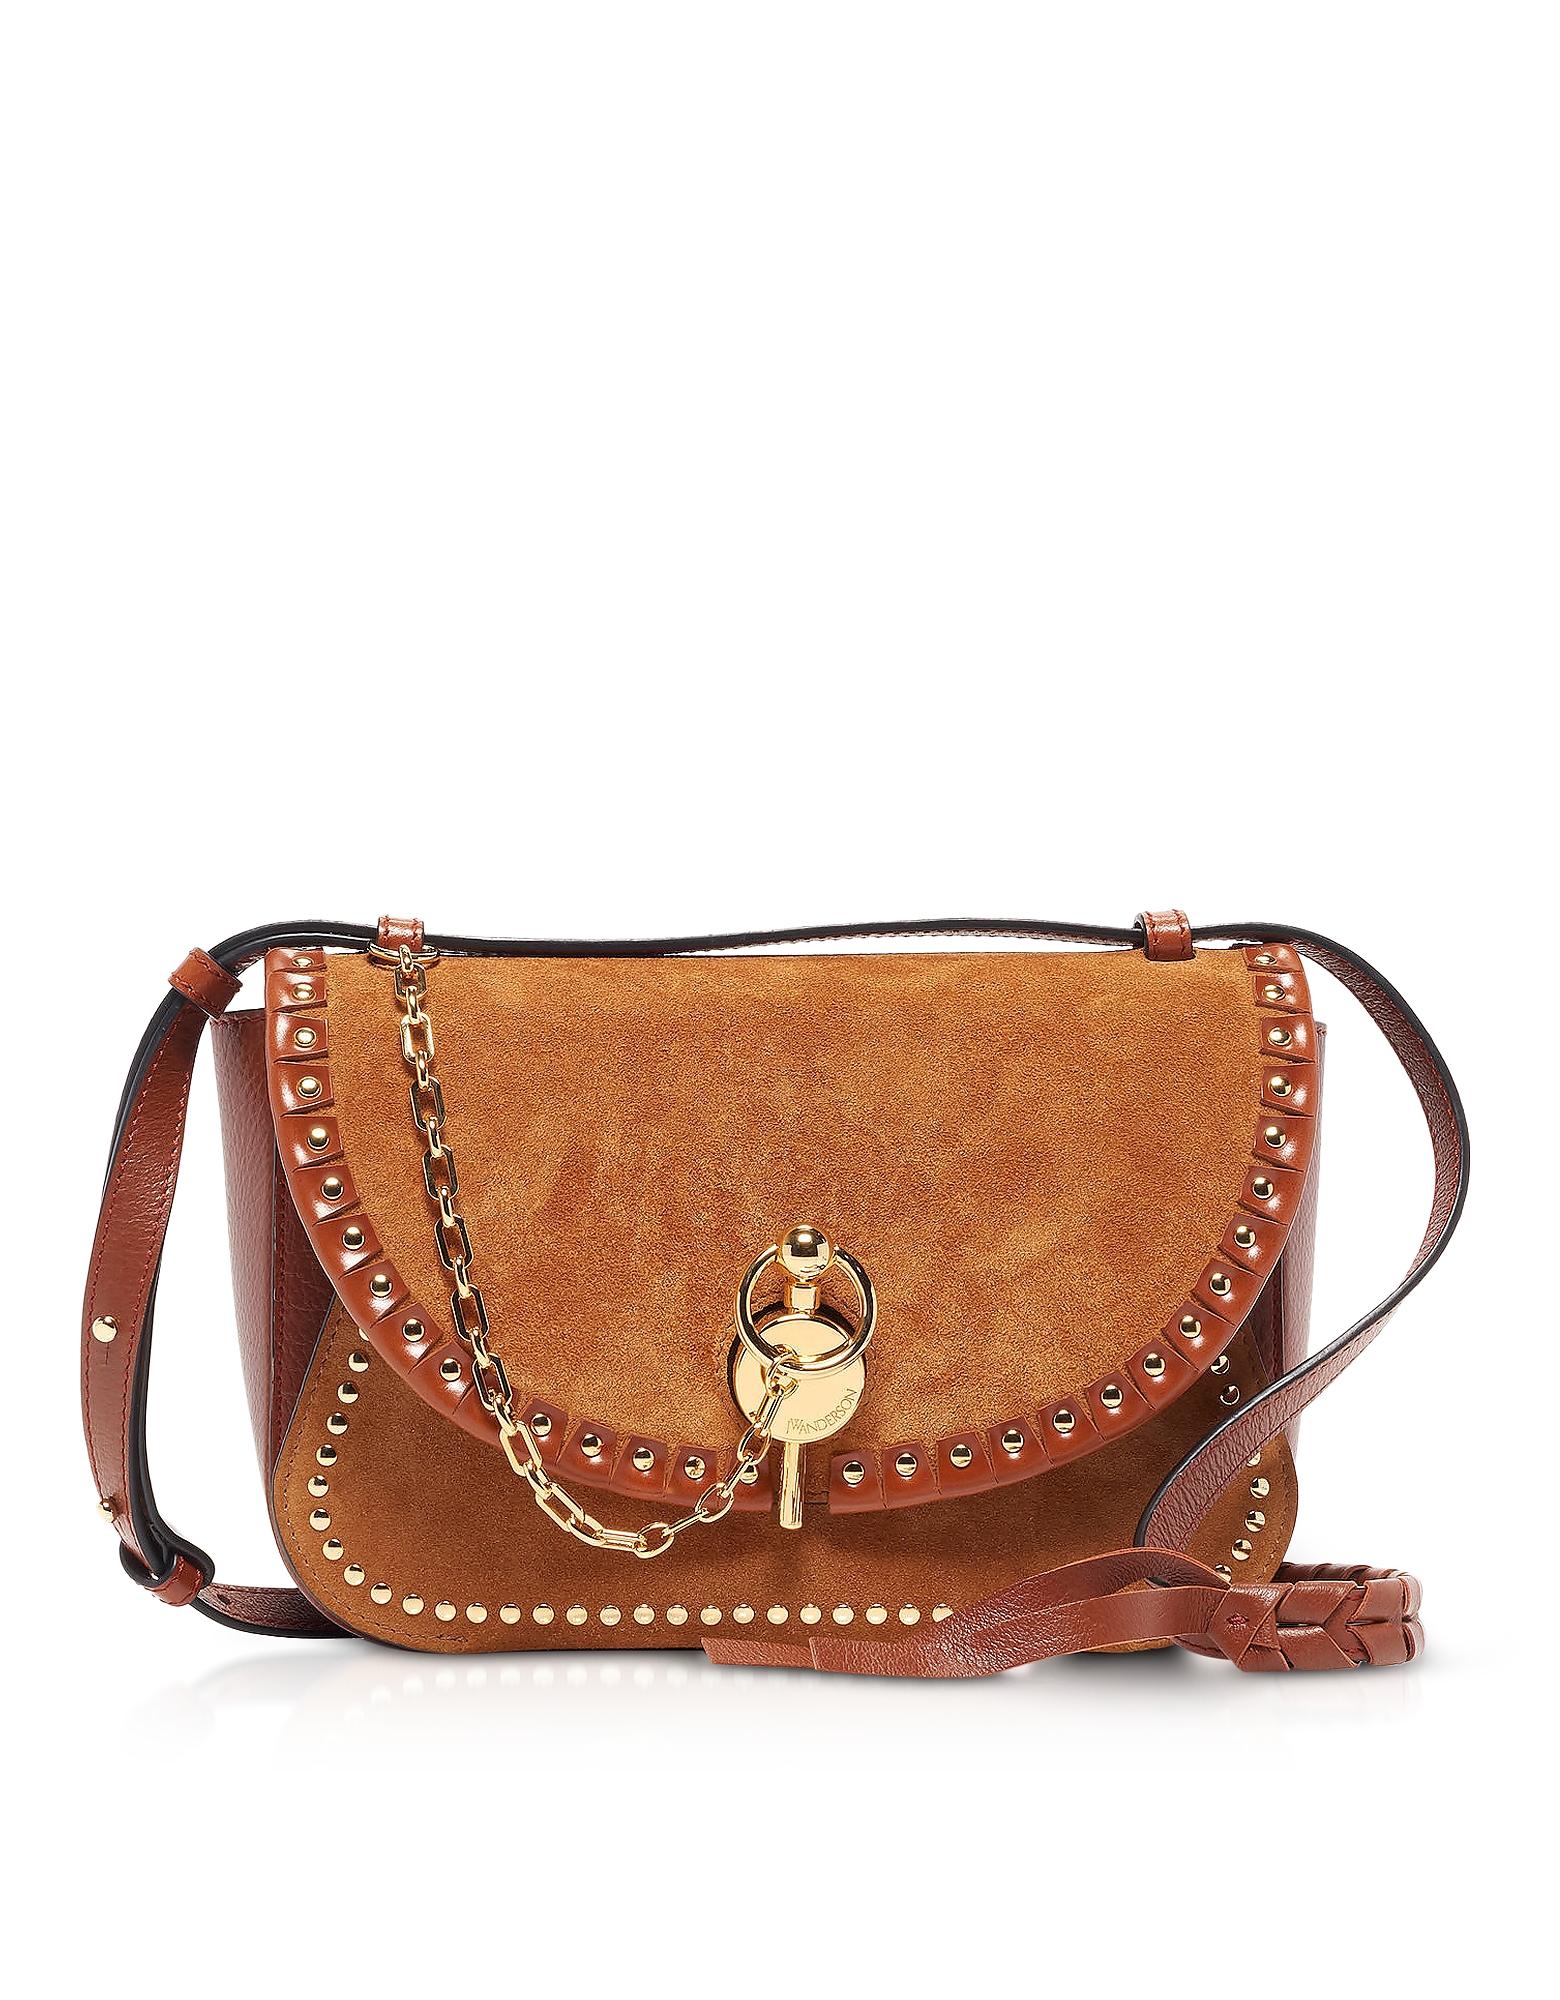 JW Anderson Designer Handbags, Sporran Suede Keyts Shoulder Bag